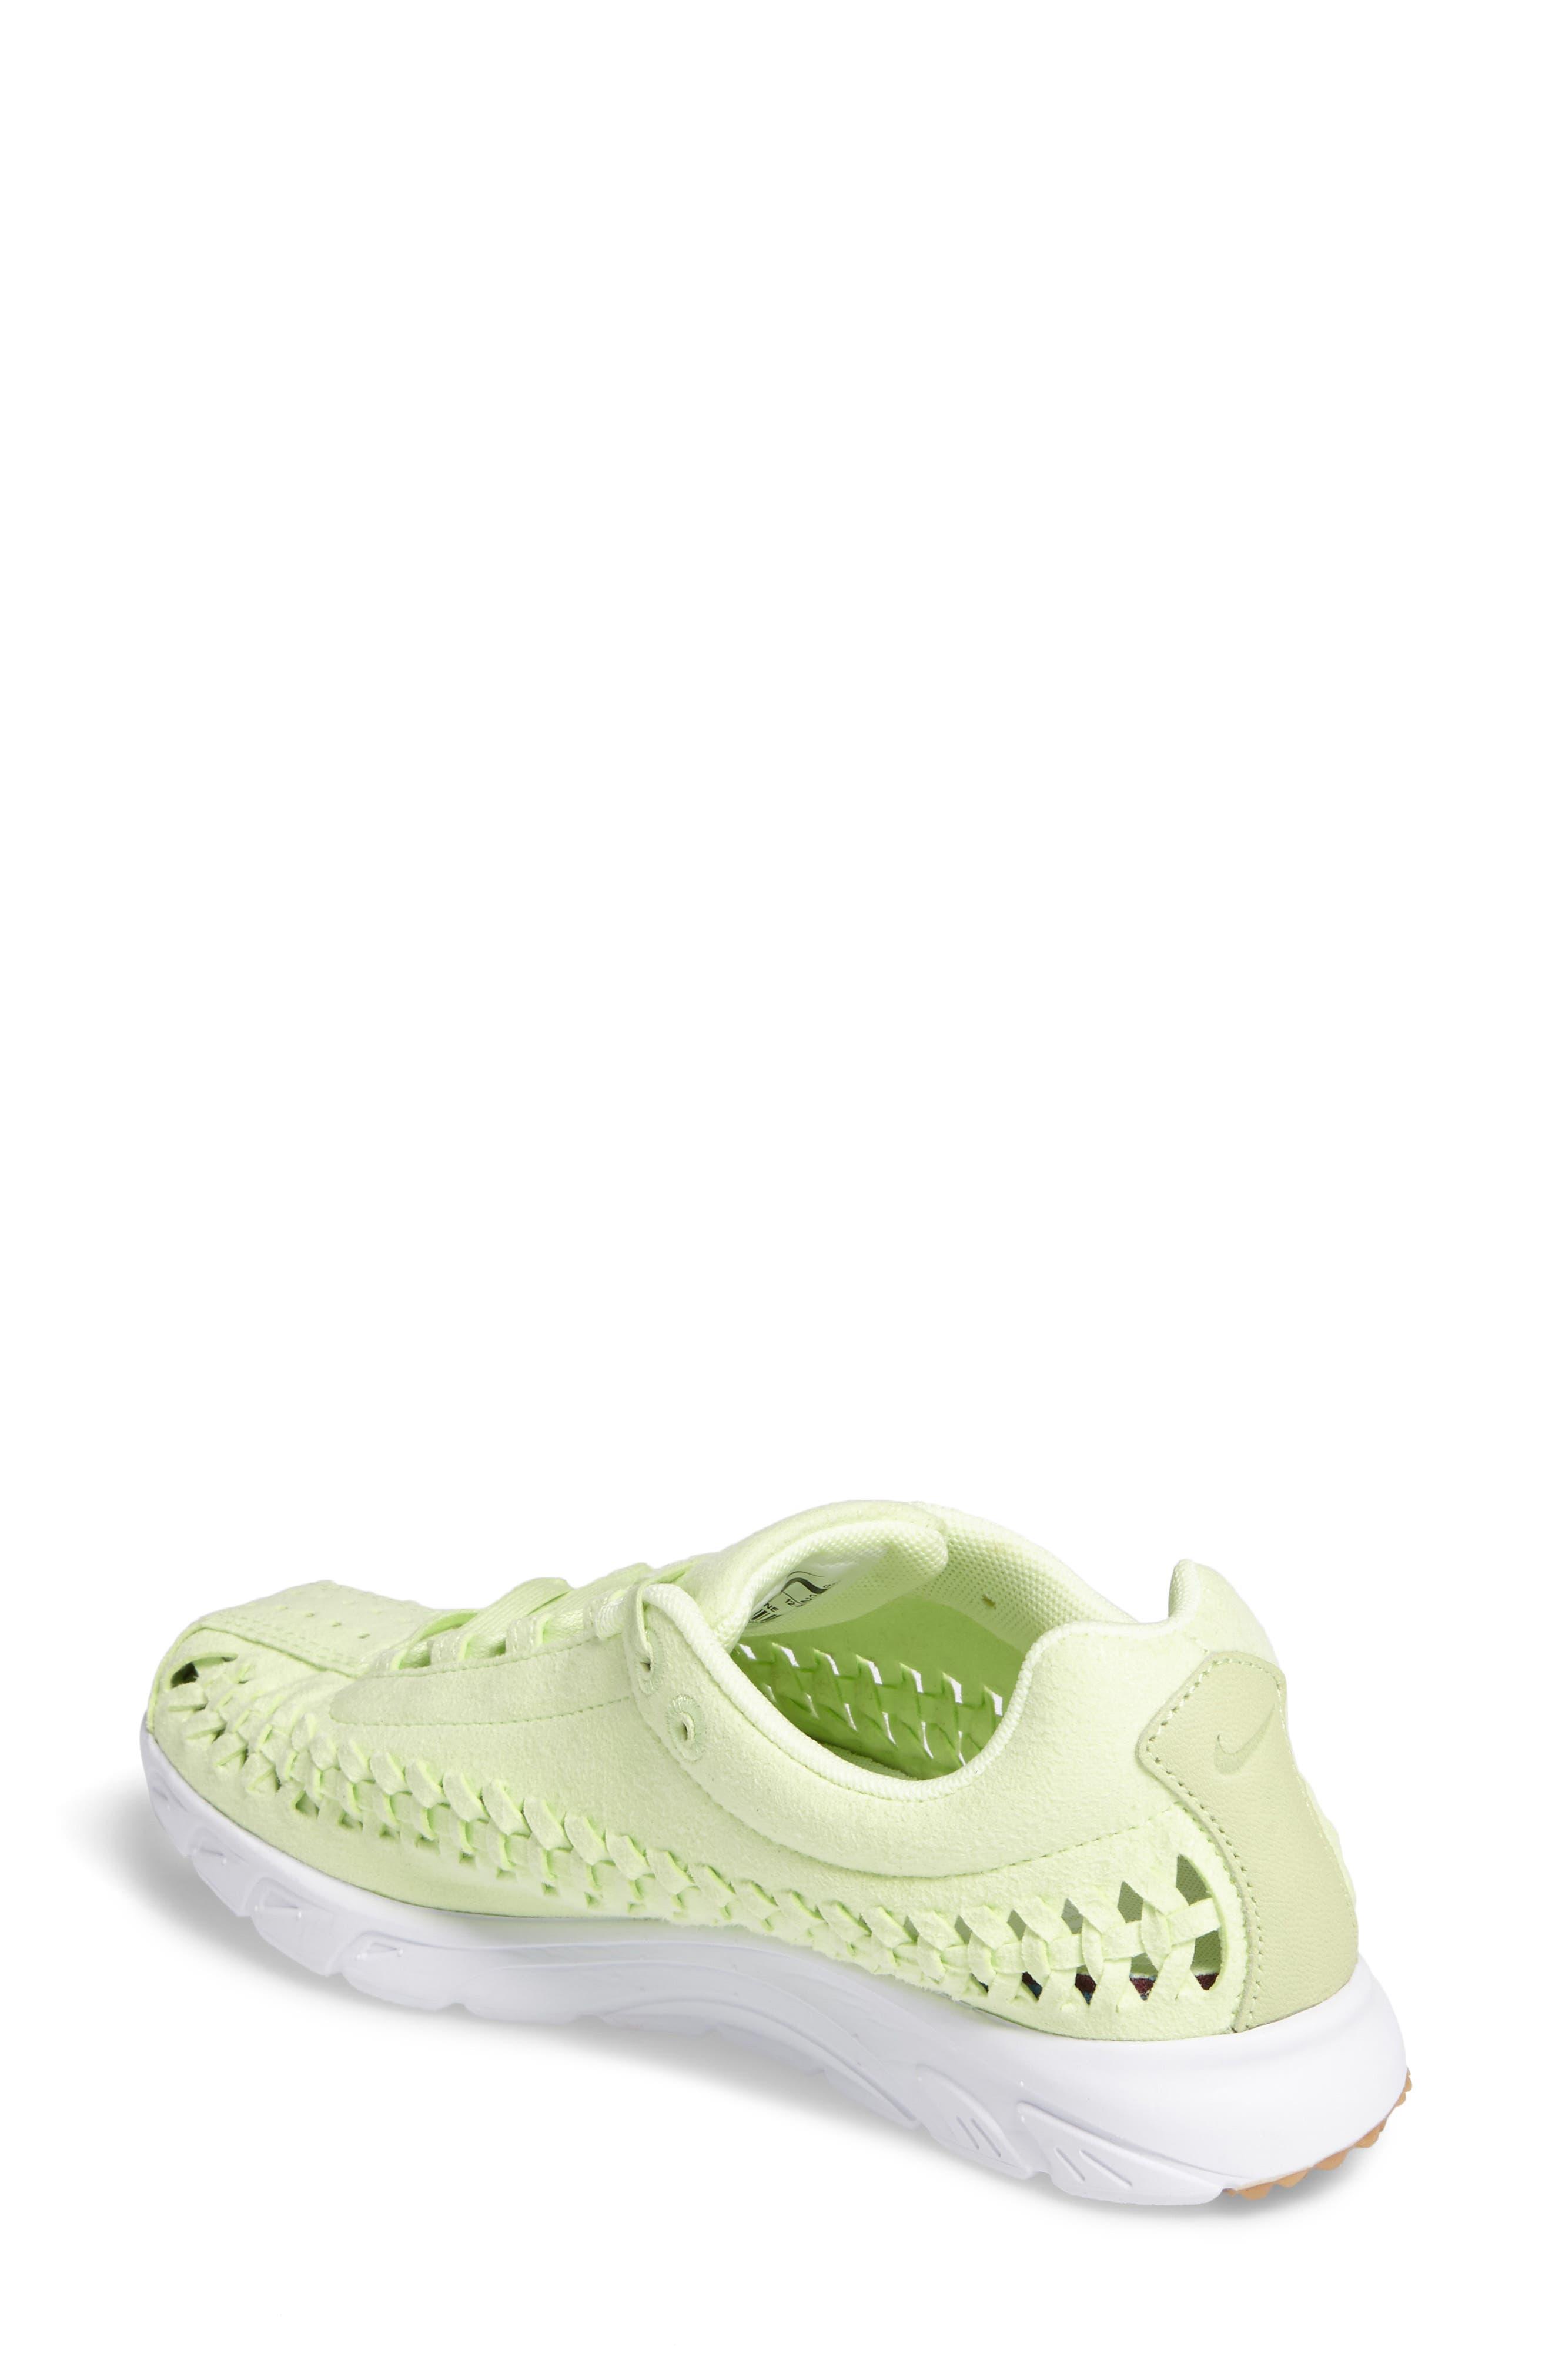 Mayfly Woven QS Sneaker,                             Alternate thumbnail 2, color,                             301